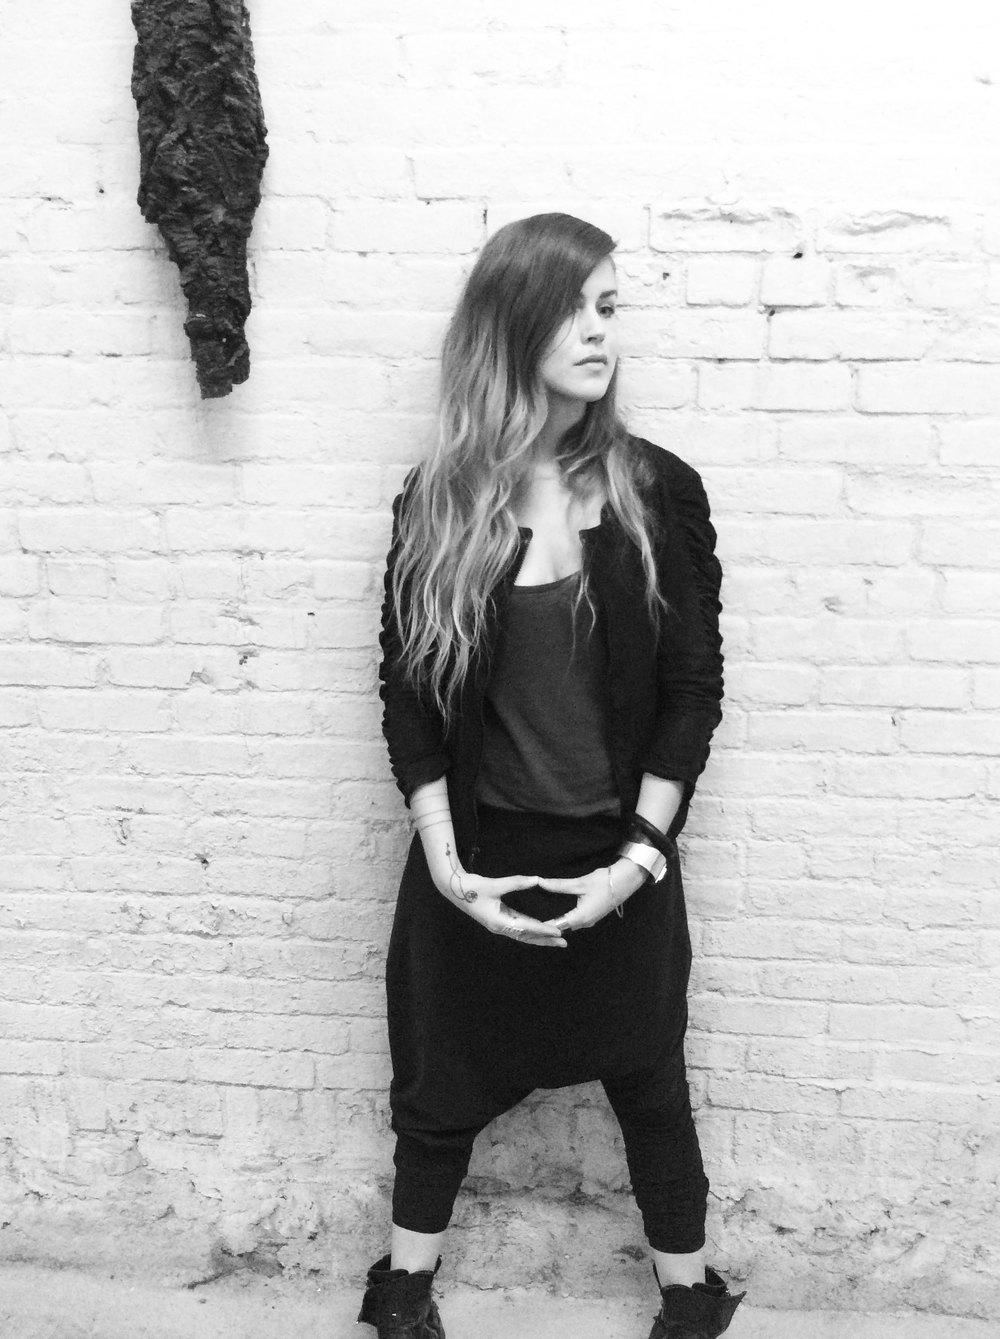 Halvorsen at her studio in Brooklyn, NY.